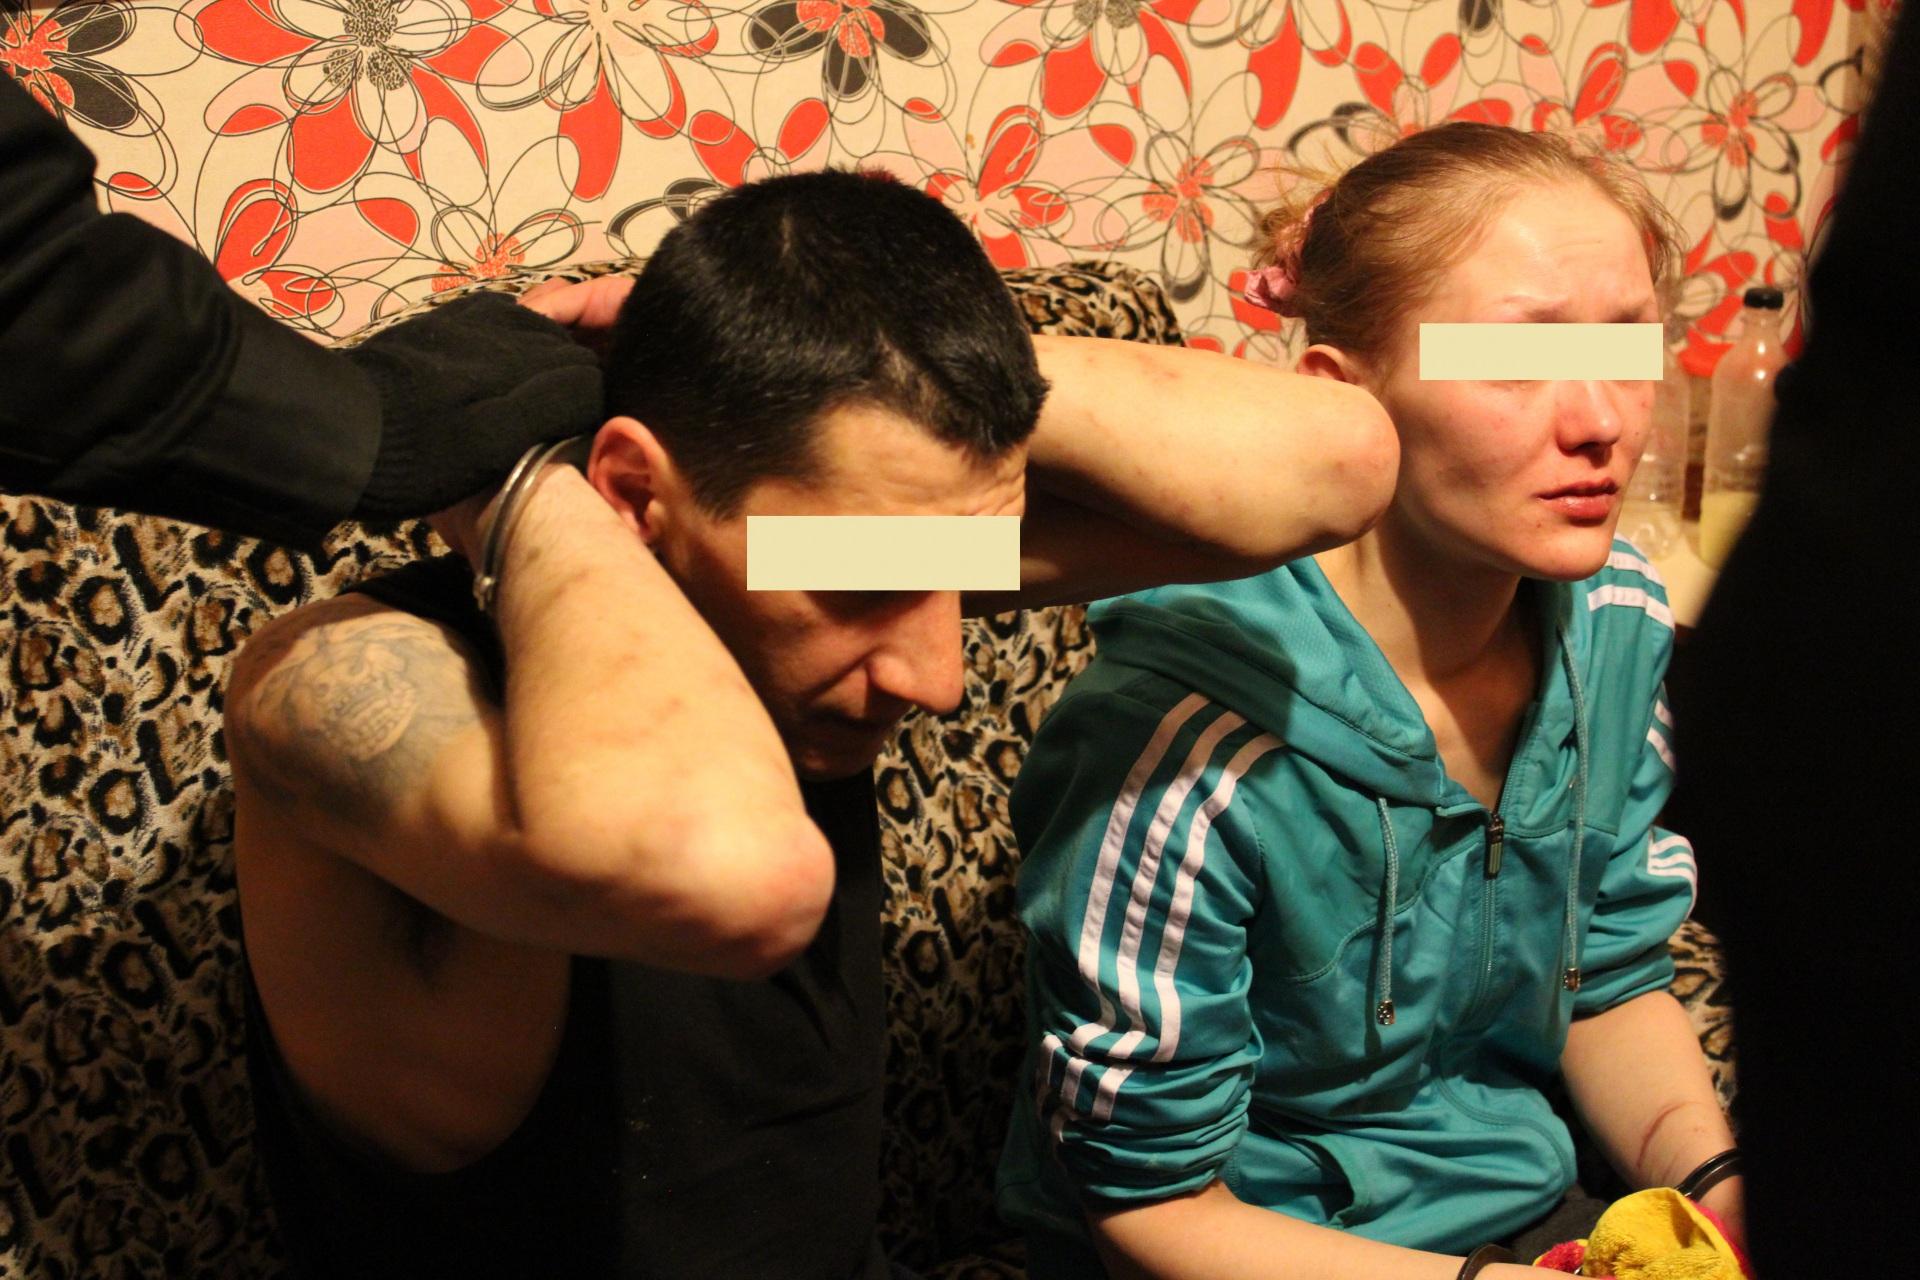 В столице Коми ликвидировали наркопритон